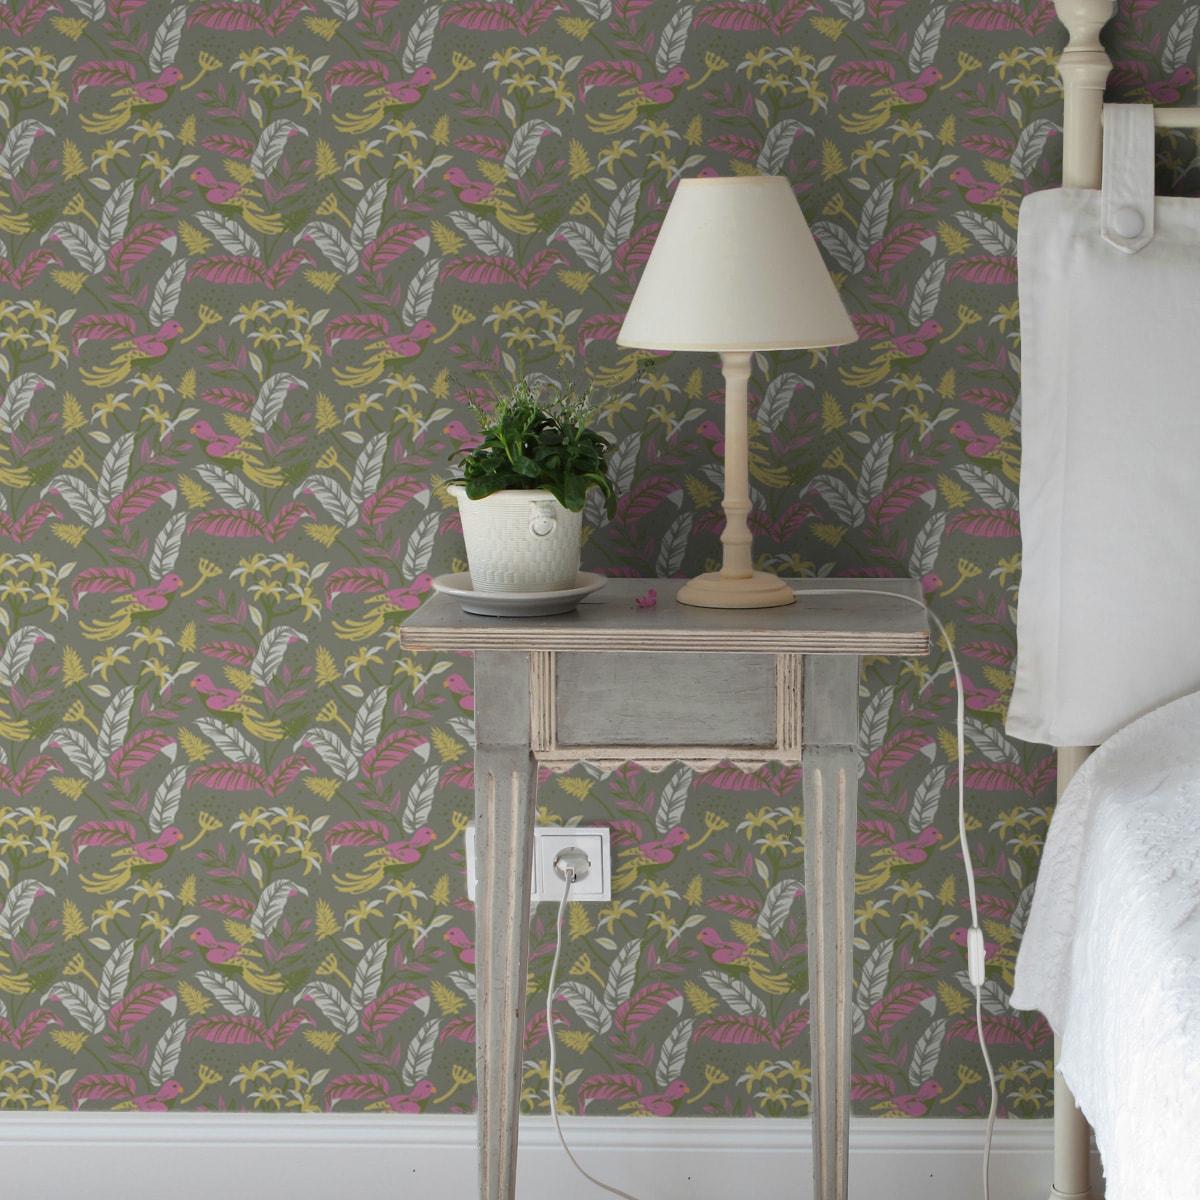 grün: Aus dem GMM-BERLIN.com Sortiment: . Schöne Wandgestaltung: Grüne Little Square Tapete angepasst an #blumen #blüten #frühling #kirschblüte #spatz #vogel für individuelles Interiordesign